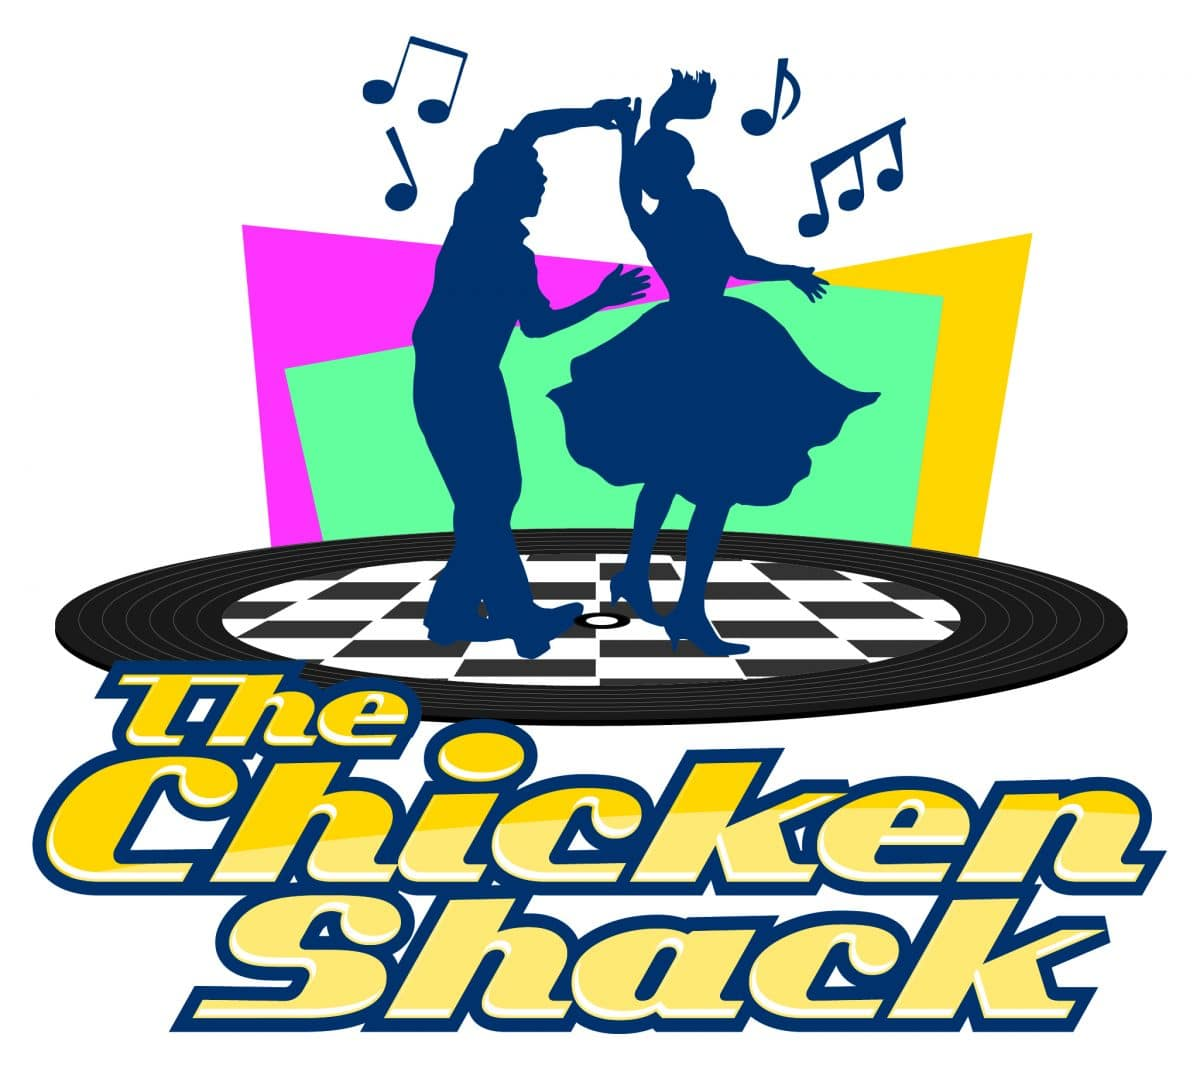 Chicken Shack, dance class, jive, rock n roll, East London, jive dance class, May, Limehouse, Bow, Poplar, Mile End